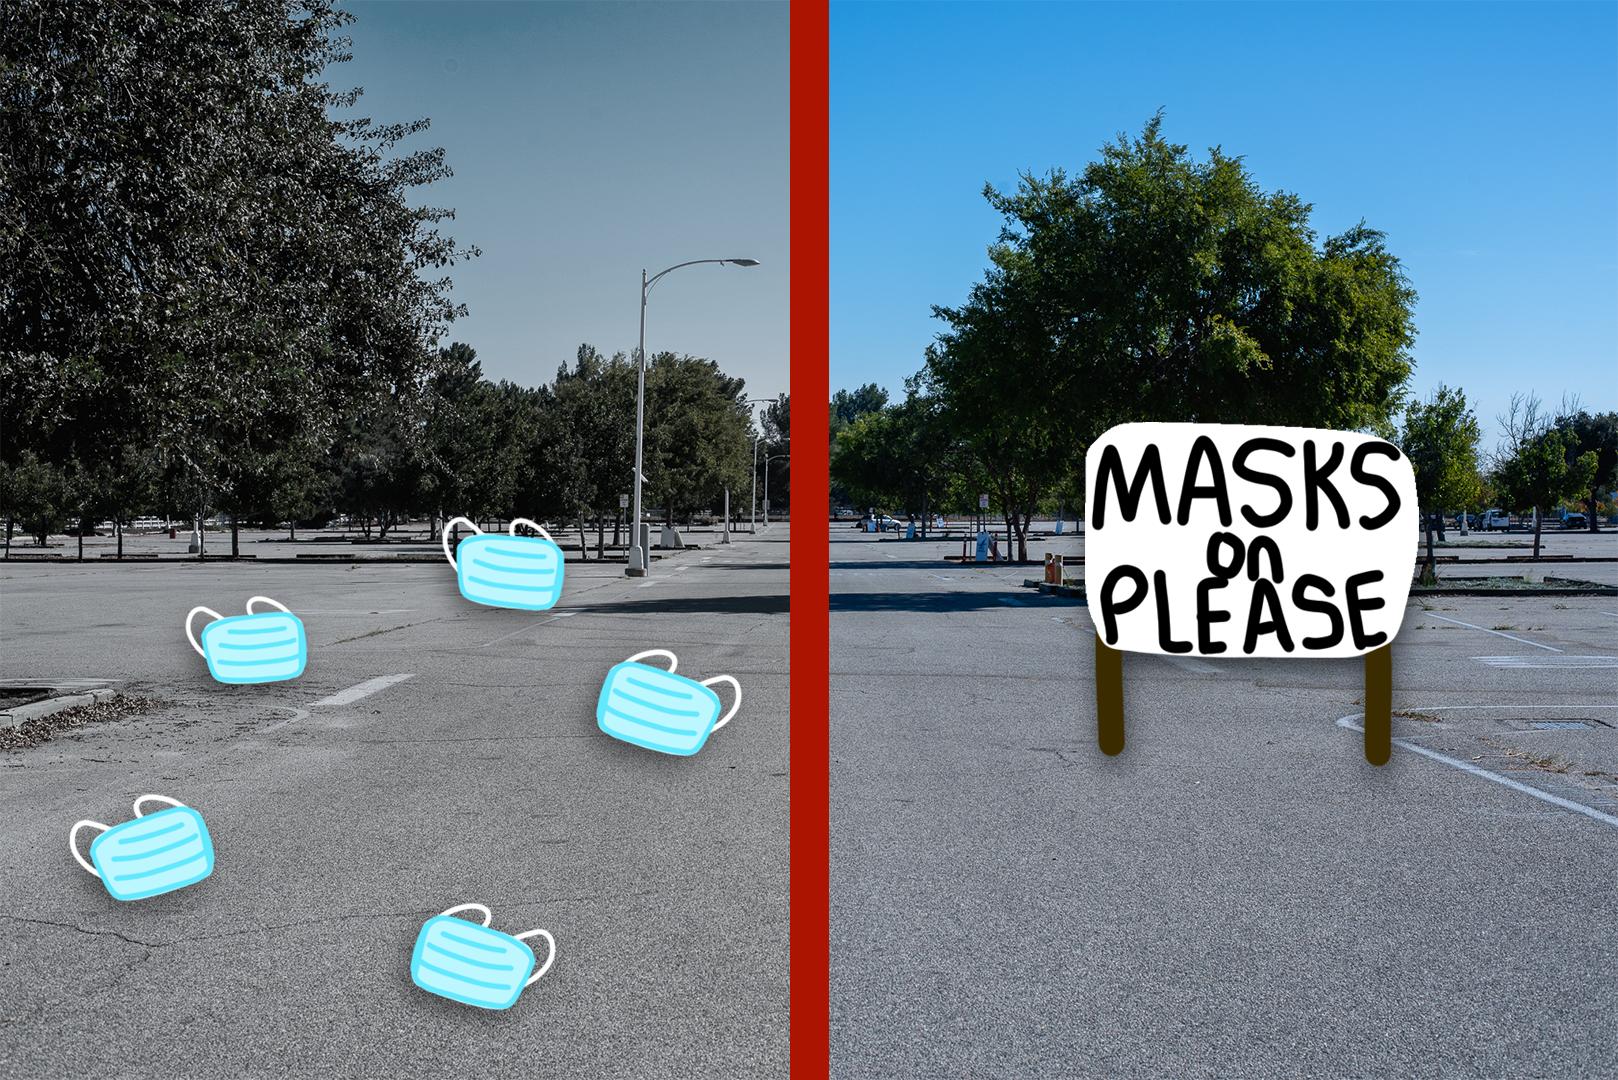 Preventing a health hazard on campus